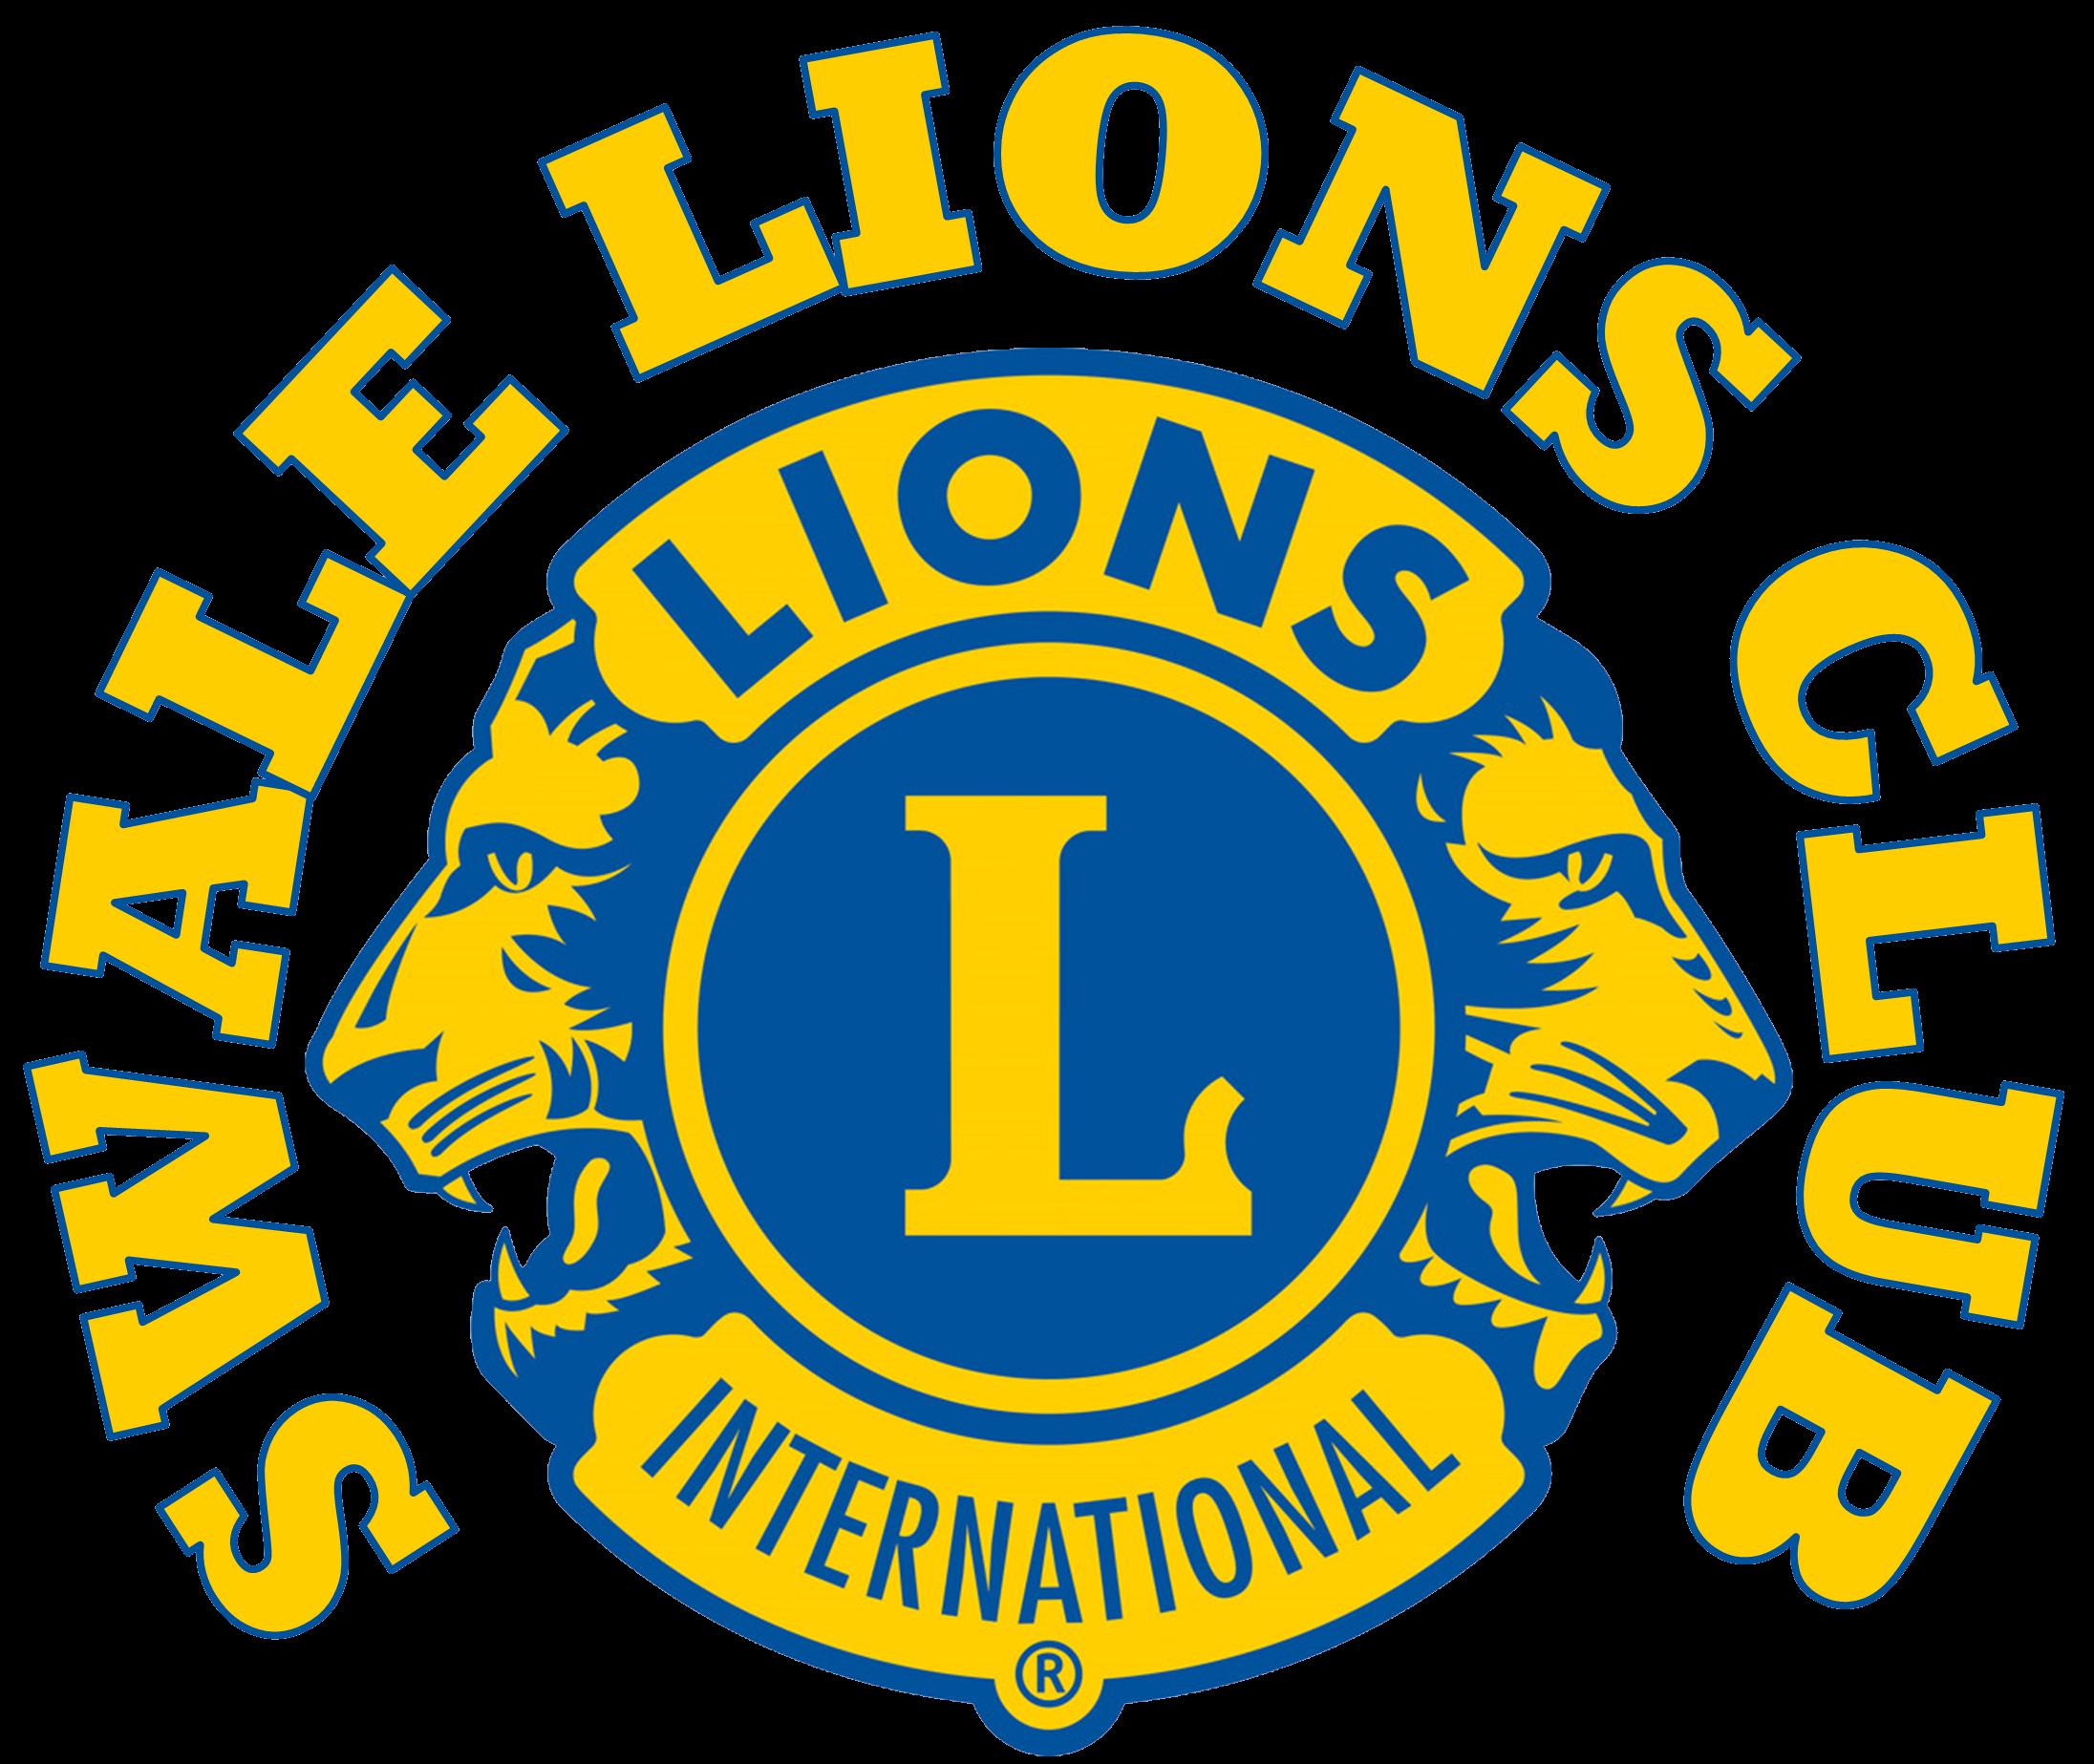 Swale Lions Club